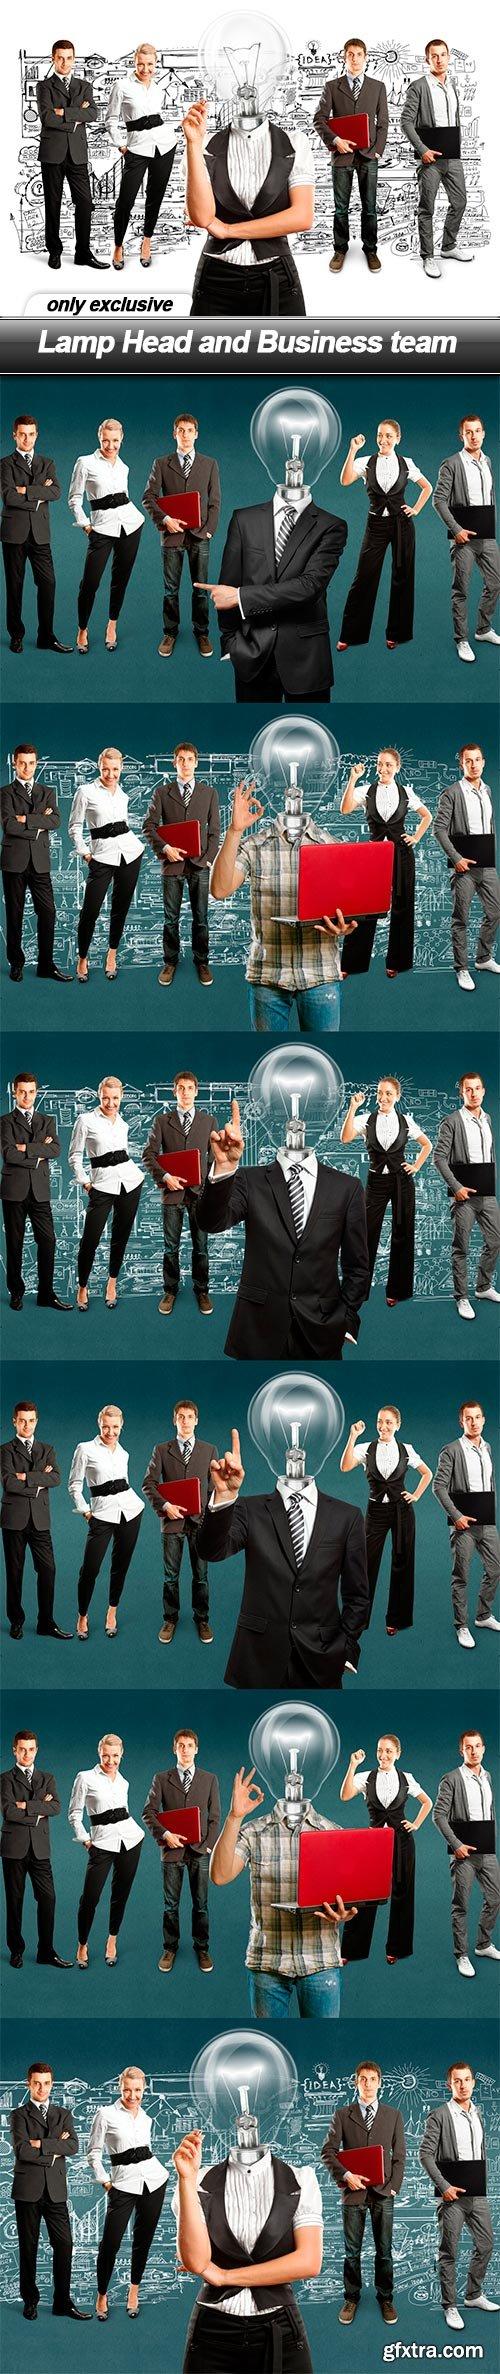 Lamp Head and Business team - 7 UHQ JPEG